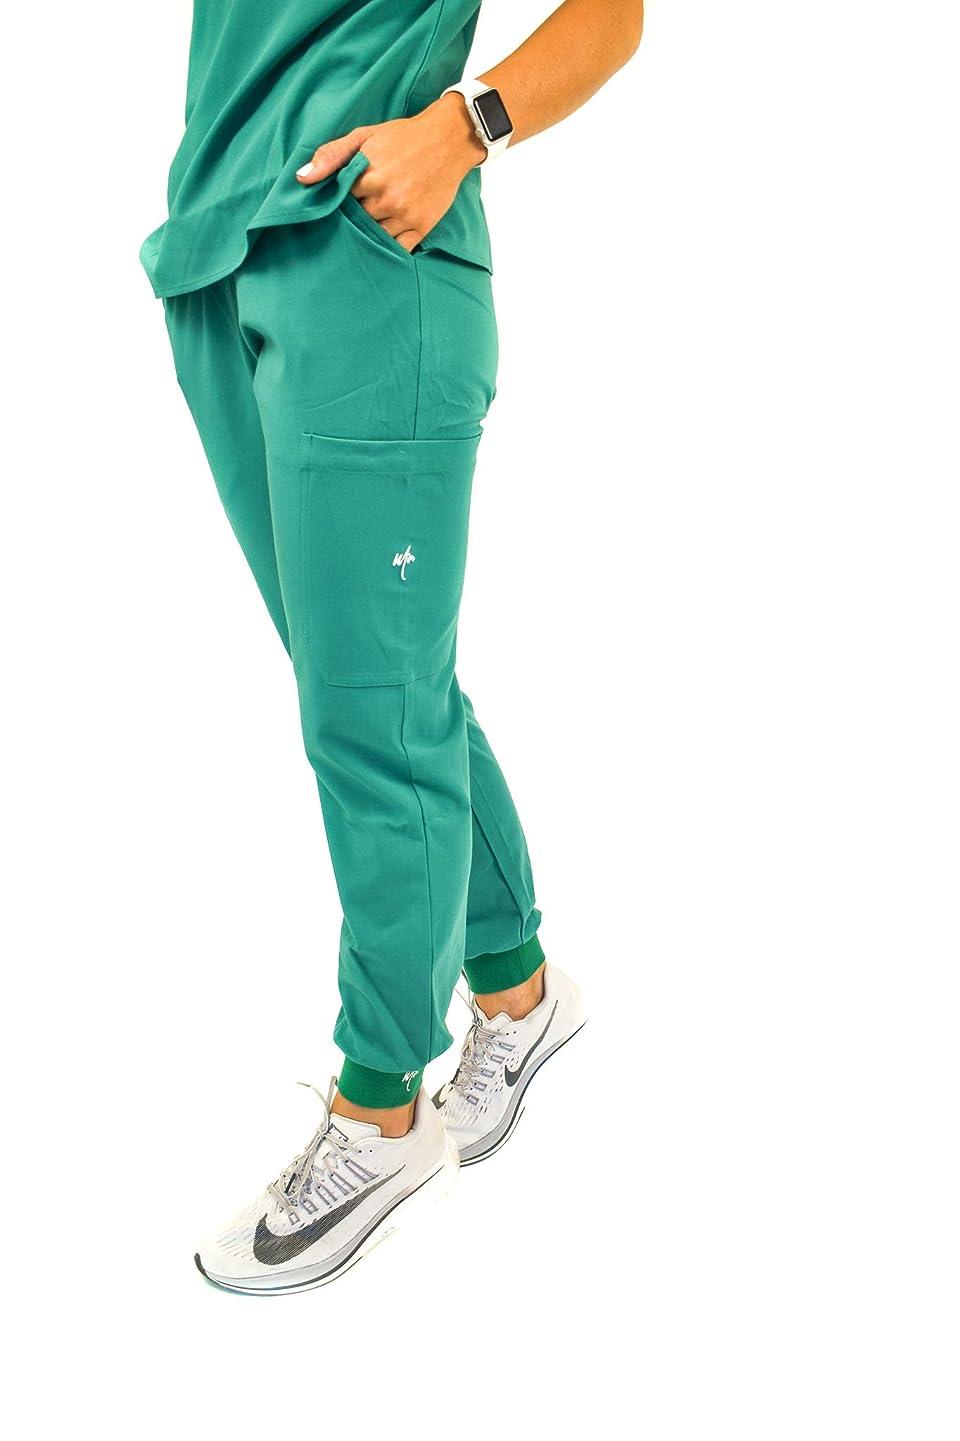 Mim Jogger Scrub Pants for Women, Skinny Leg Joggers, Ceil Blue, Black, Navy Blue, Green